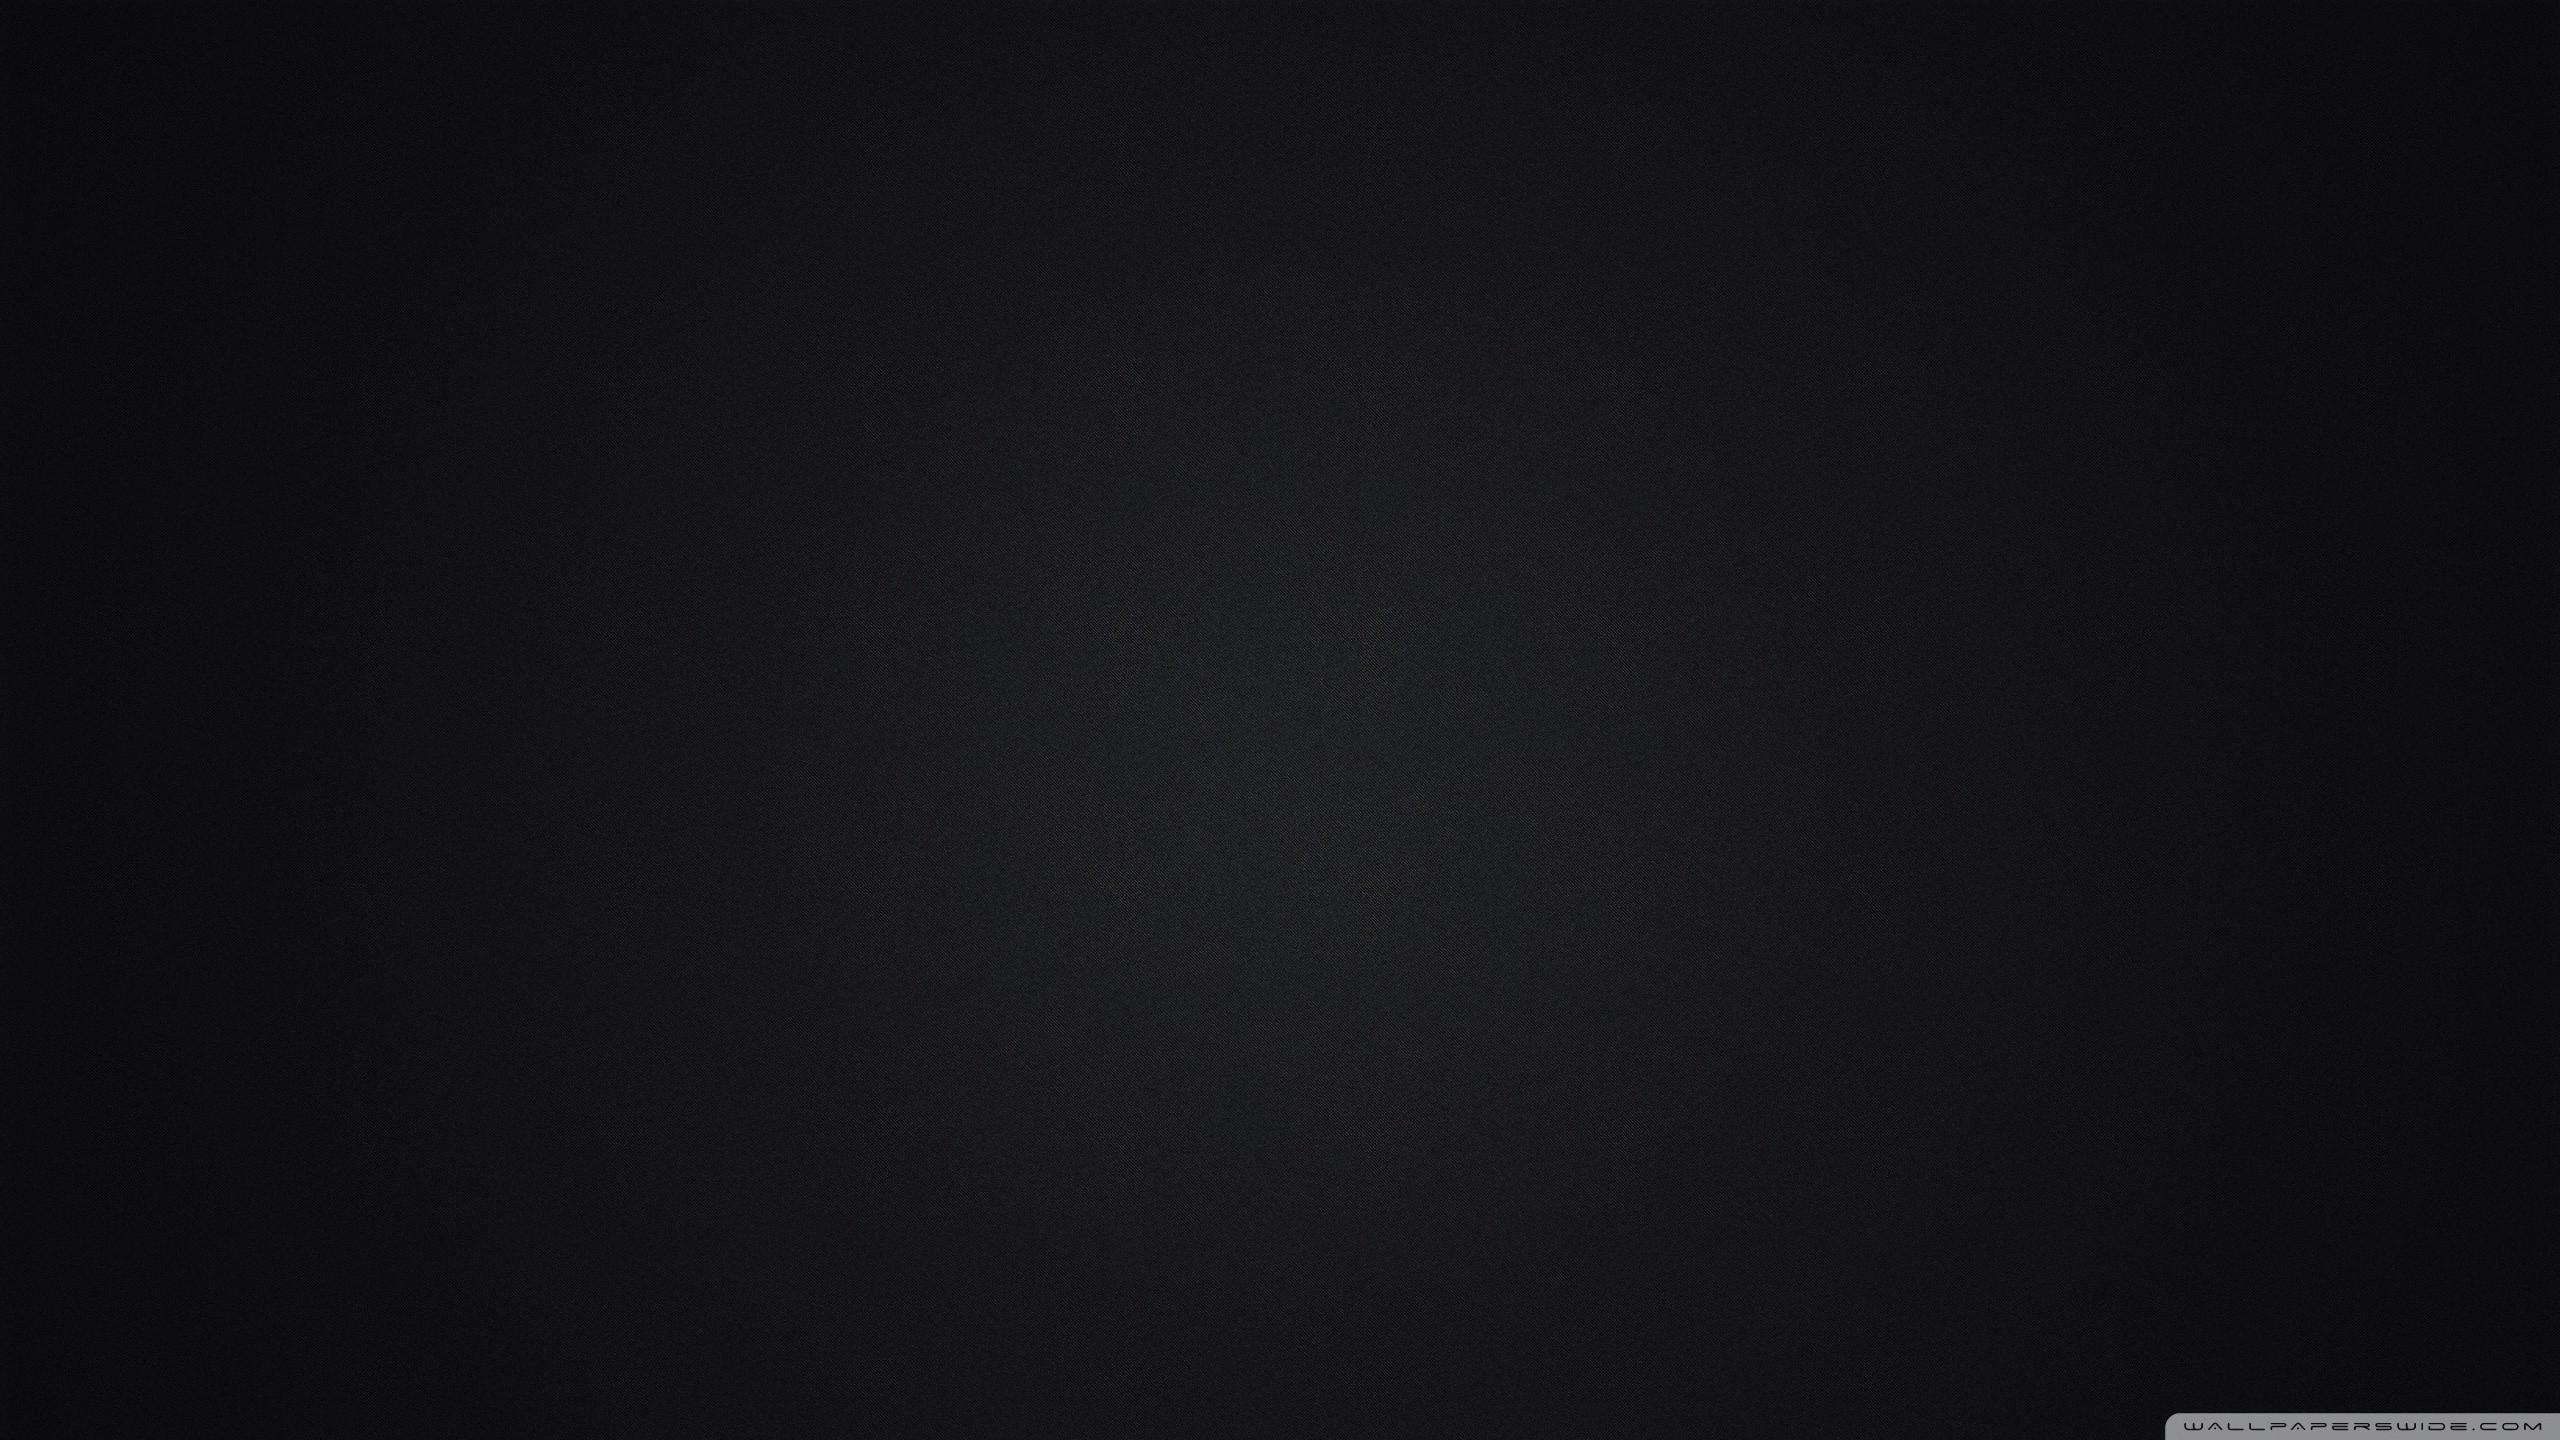 Plain Black Screen 2 Background Wallpaper